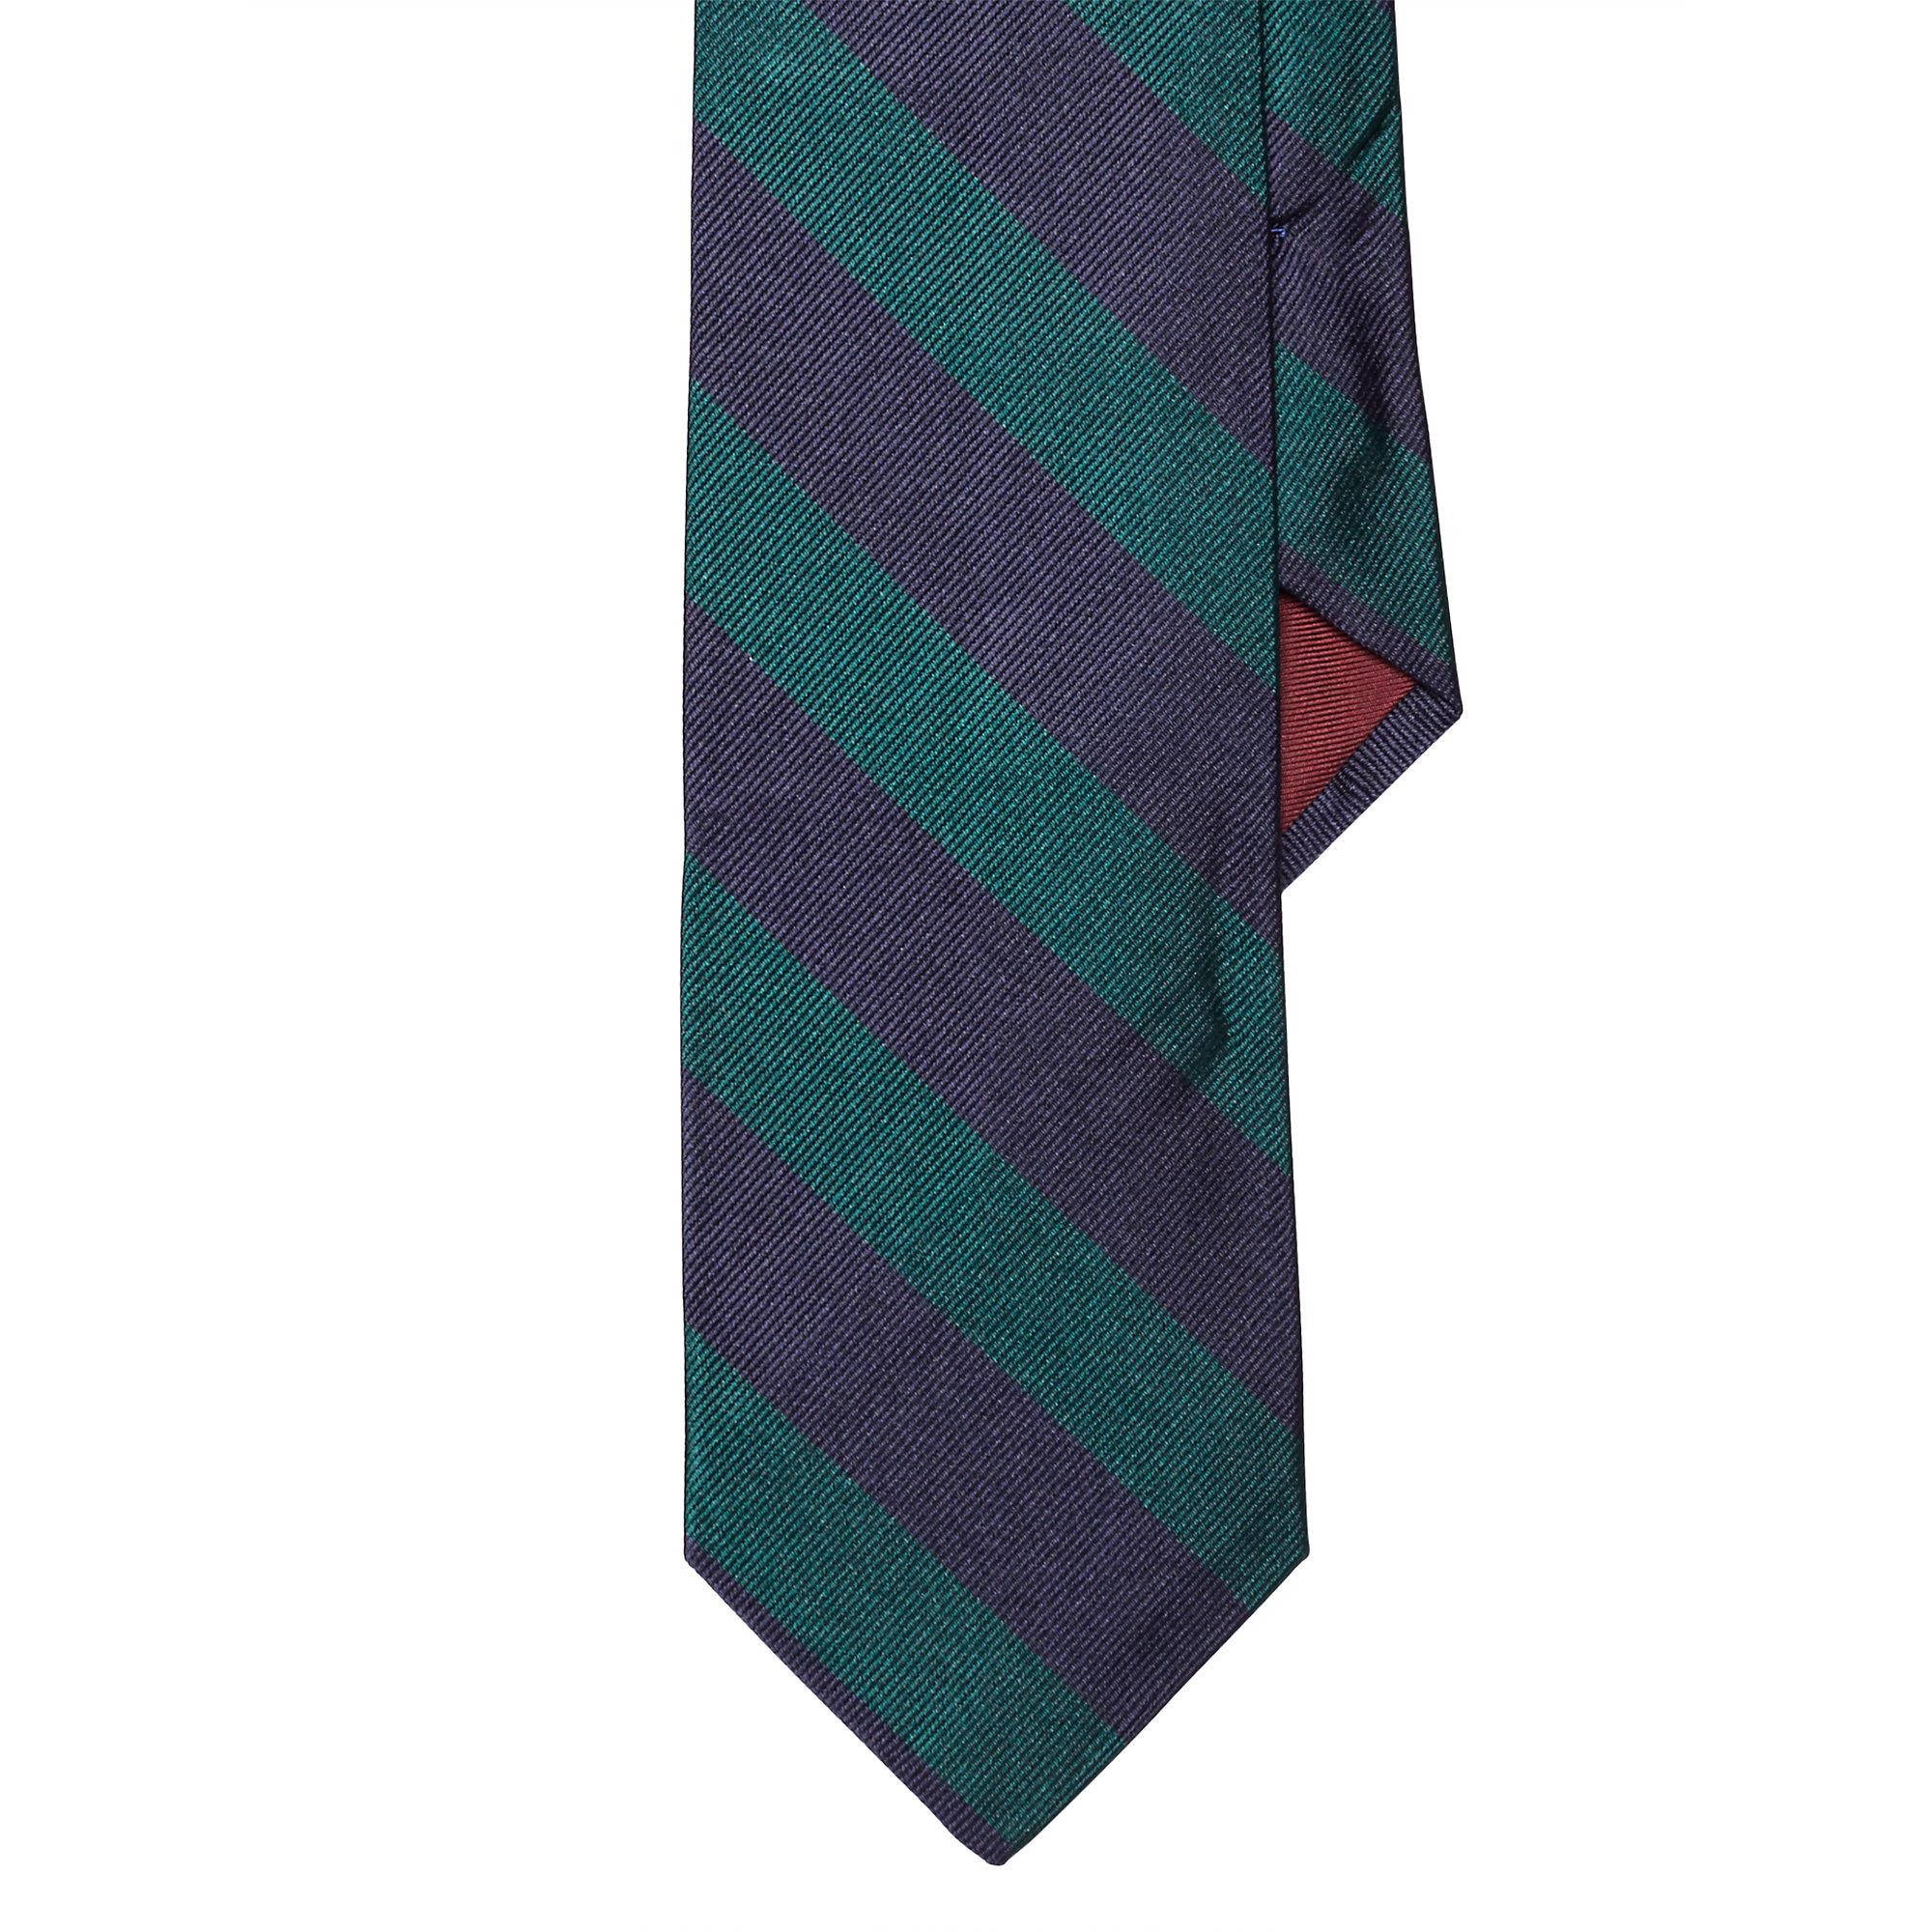 repp tie photo - 1